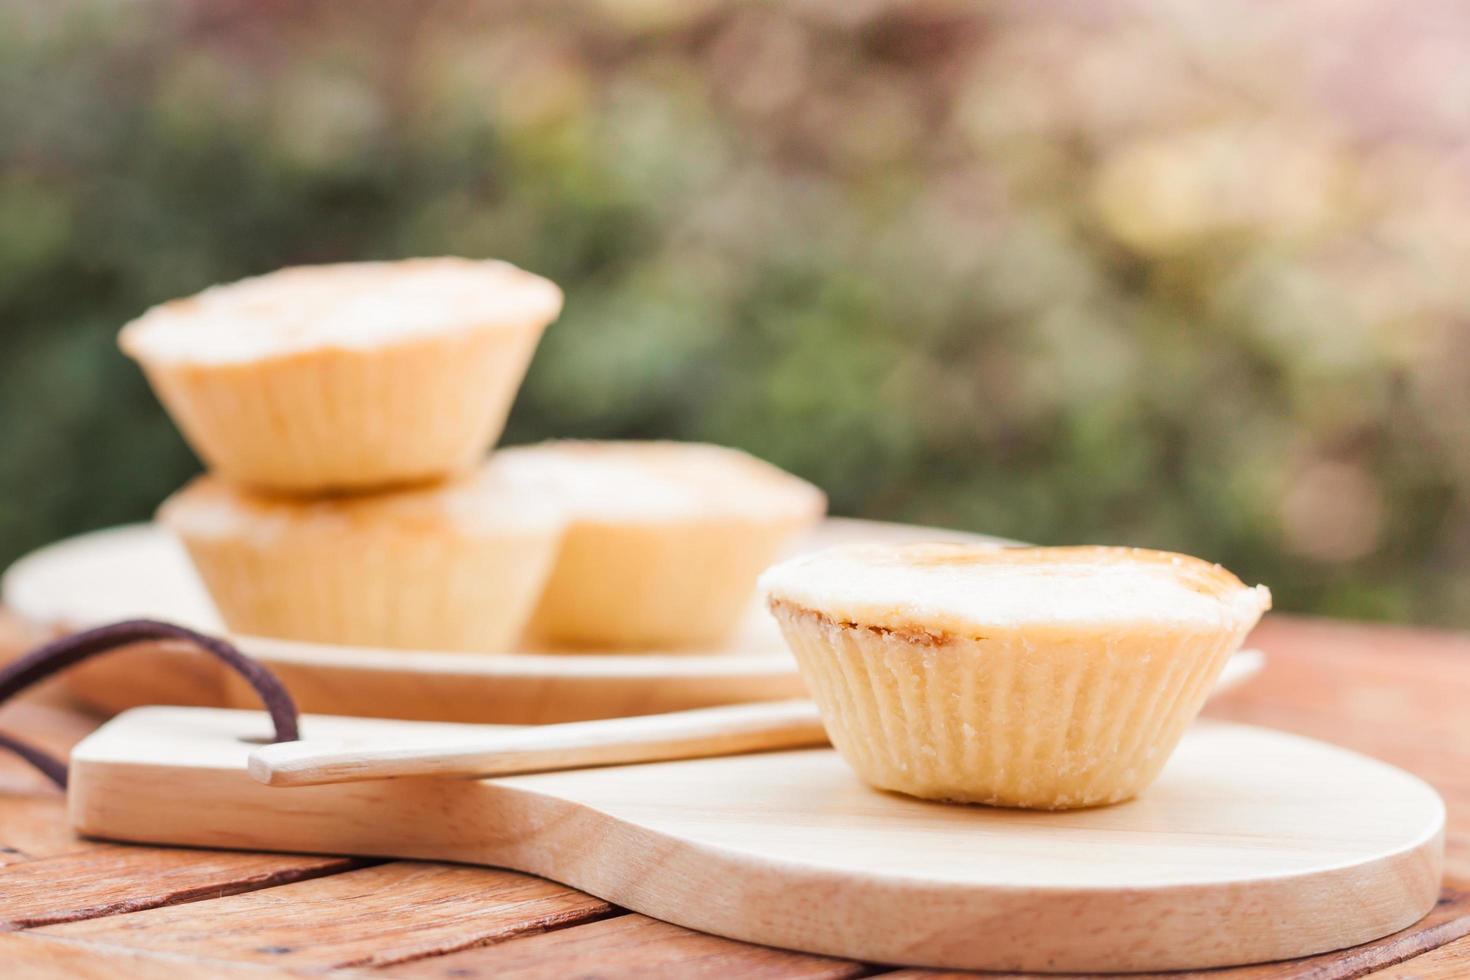 mini tartas en una mesa foto